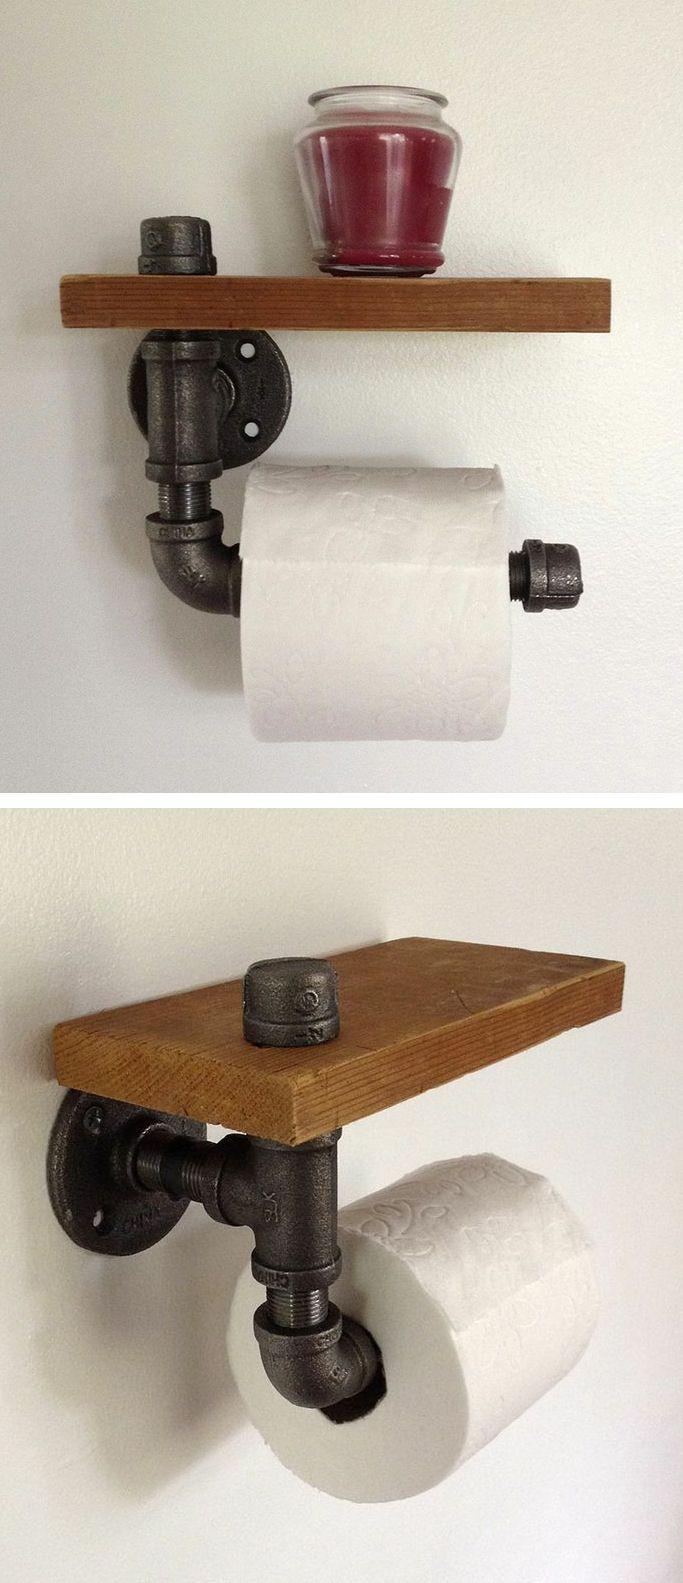 Reclaimed Wood & Pipe Toilet Paper Holder ♥ http://hellosociety.com/tracker/c.php?m=HardPin&u=type294&cid=950&url=http://scoutmob.com/p/reclaimed-wood-and-pipe-toilet-paper-holder?signup=0&via=HardPin&u=type294